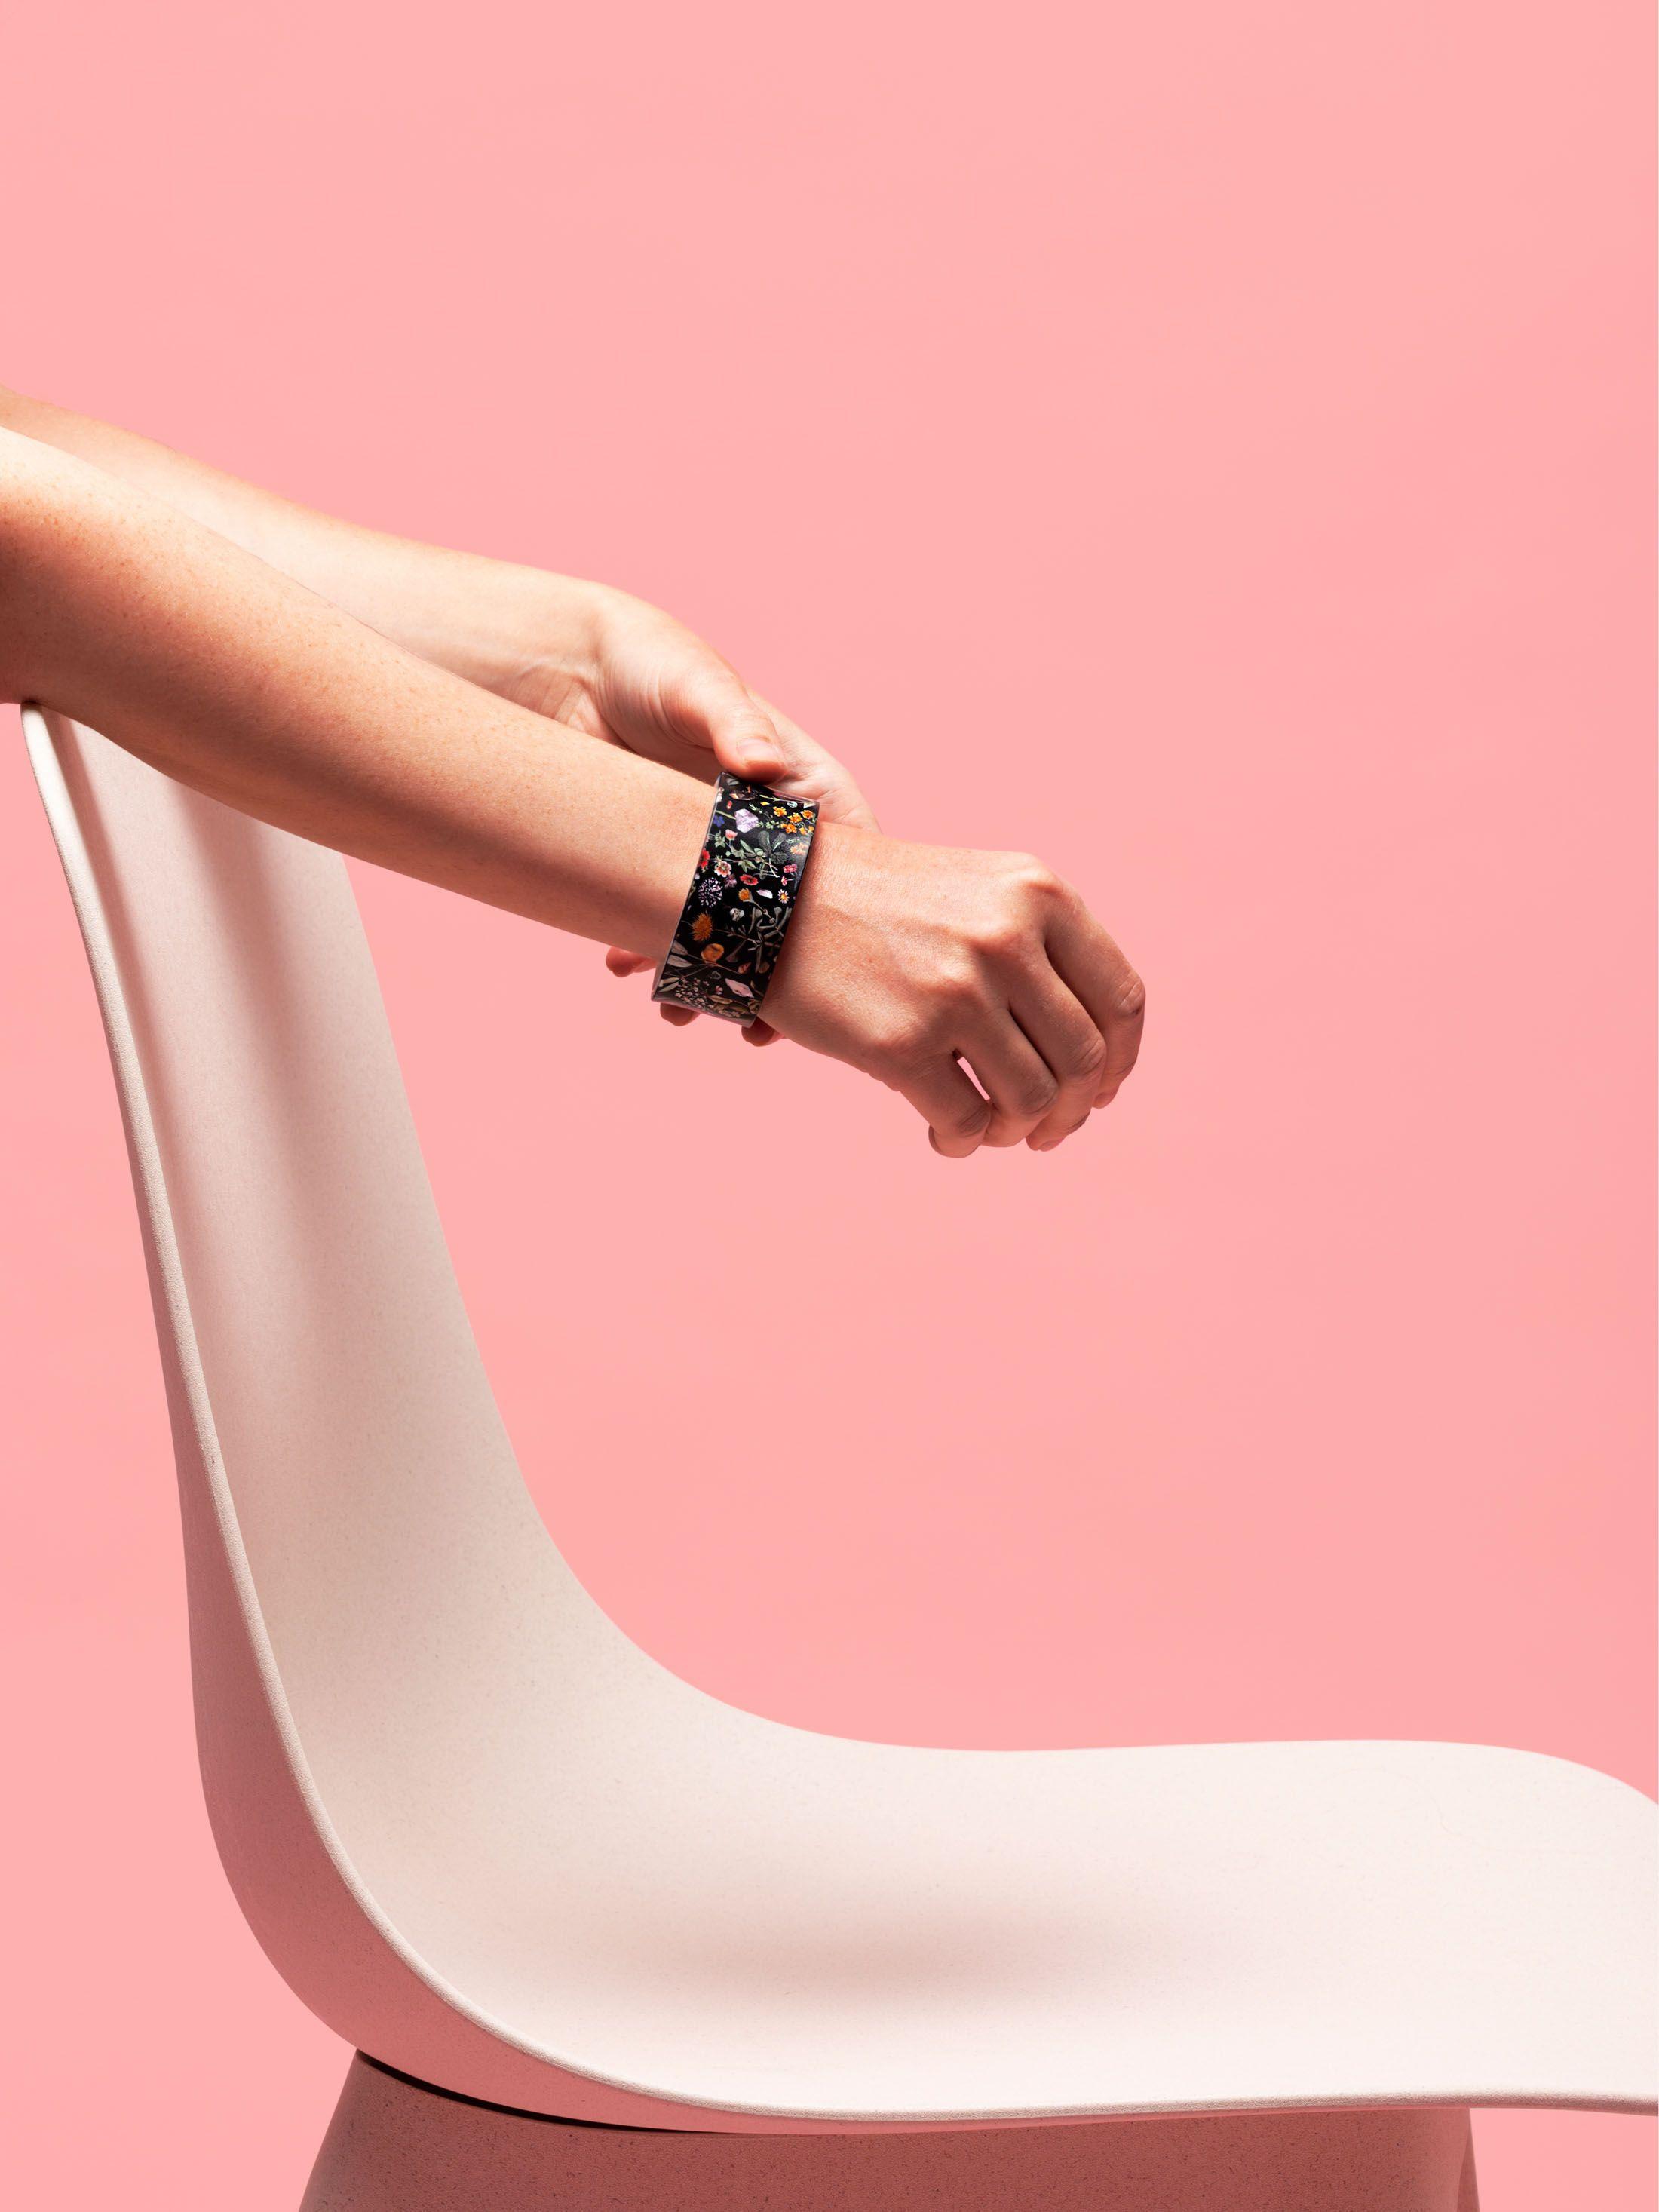 design your own friendship bracelet online